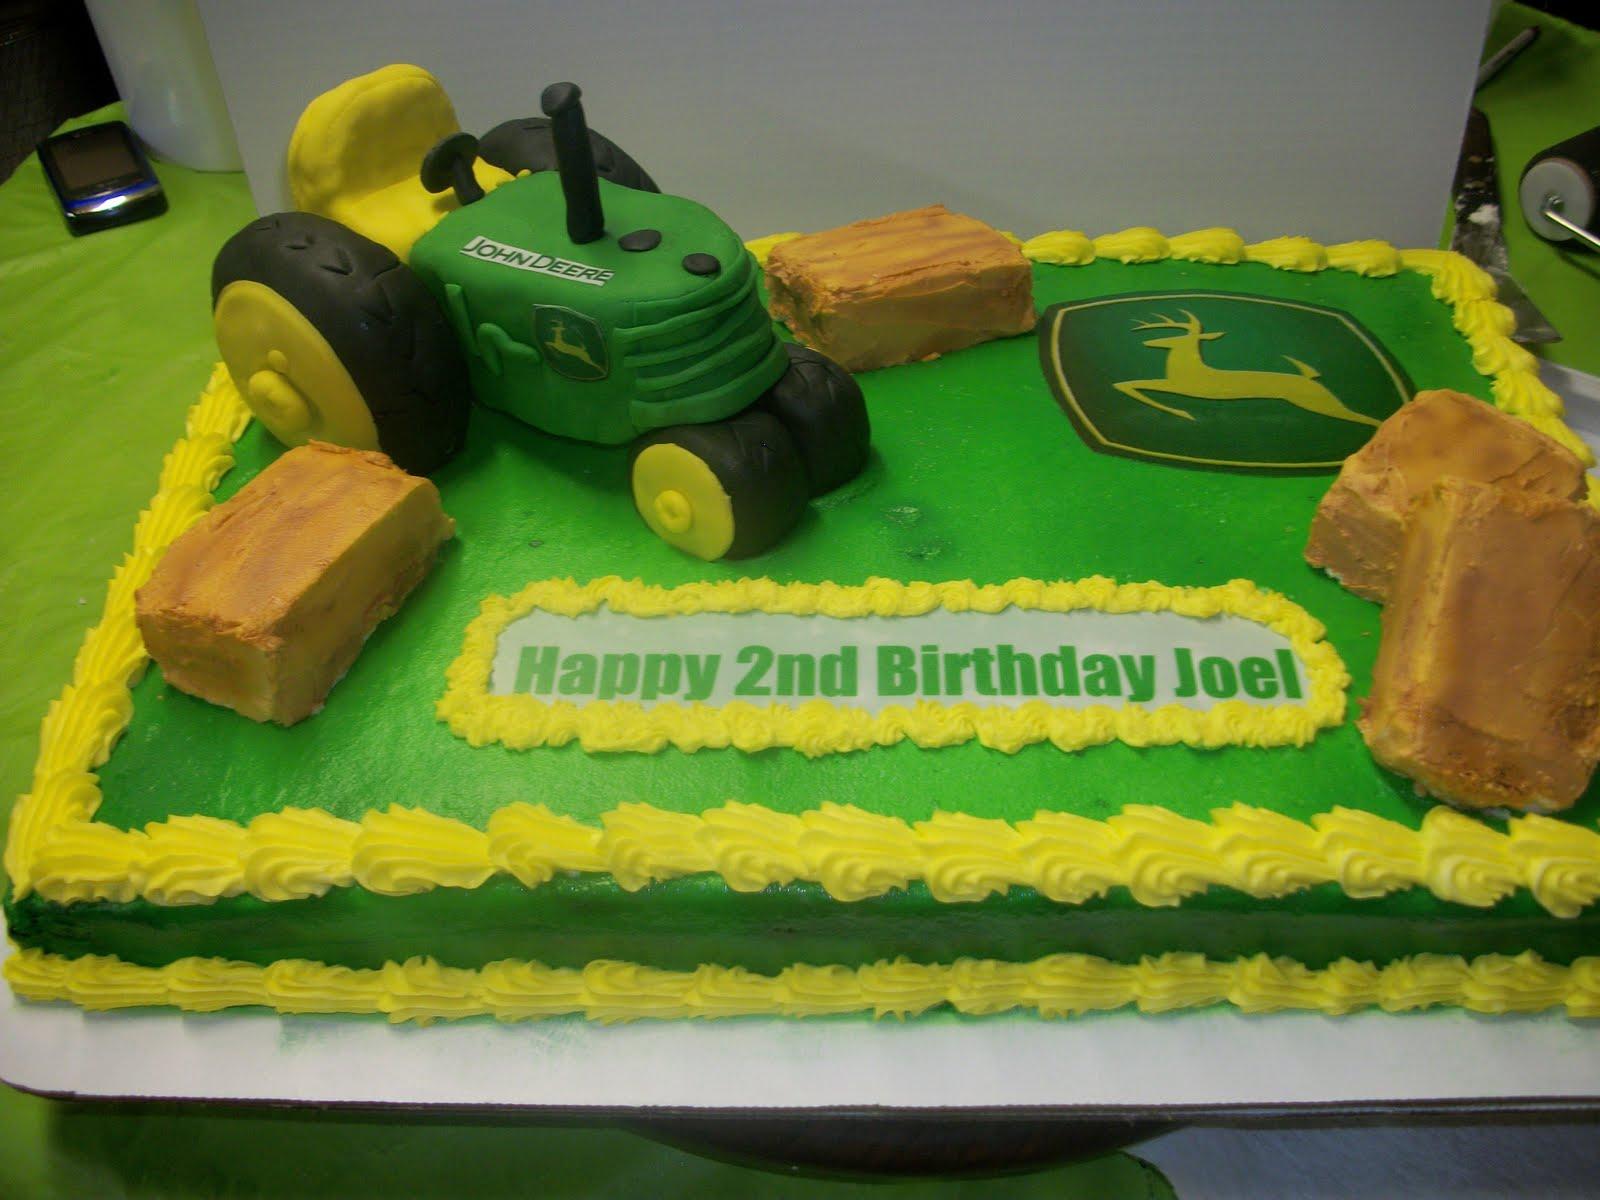 Tasty Cakes John Deere Birthday